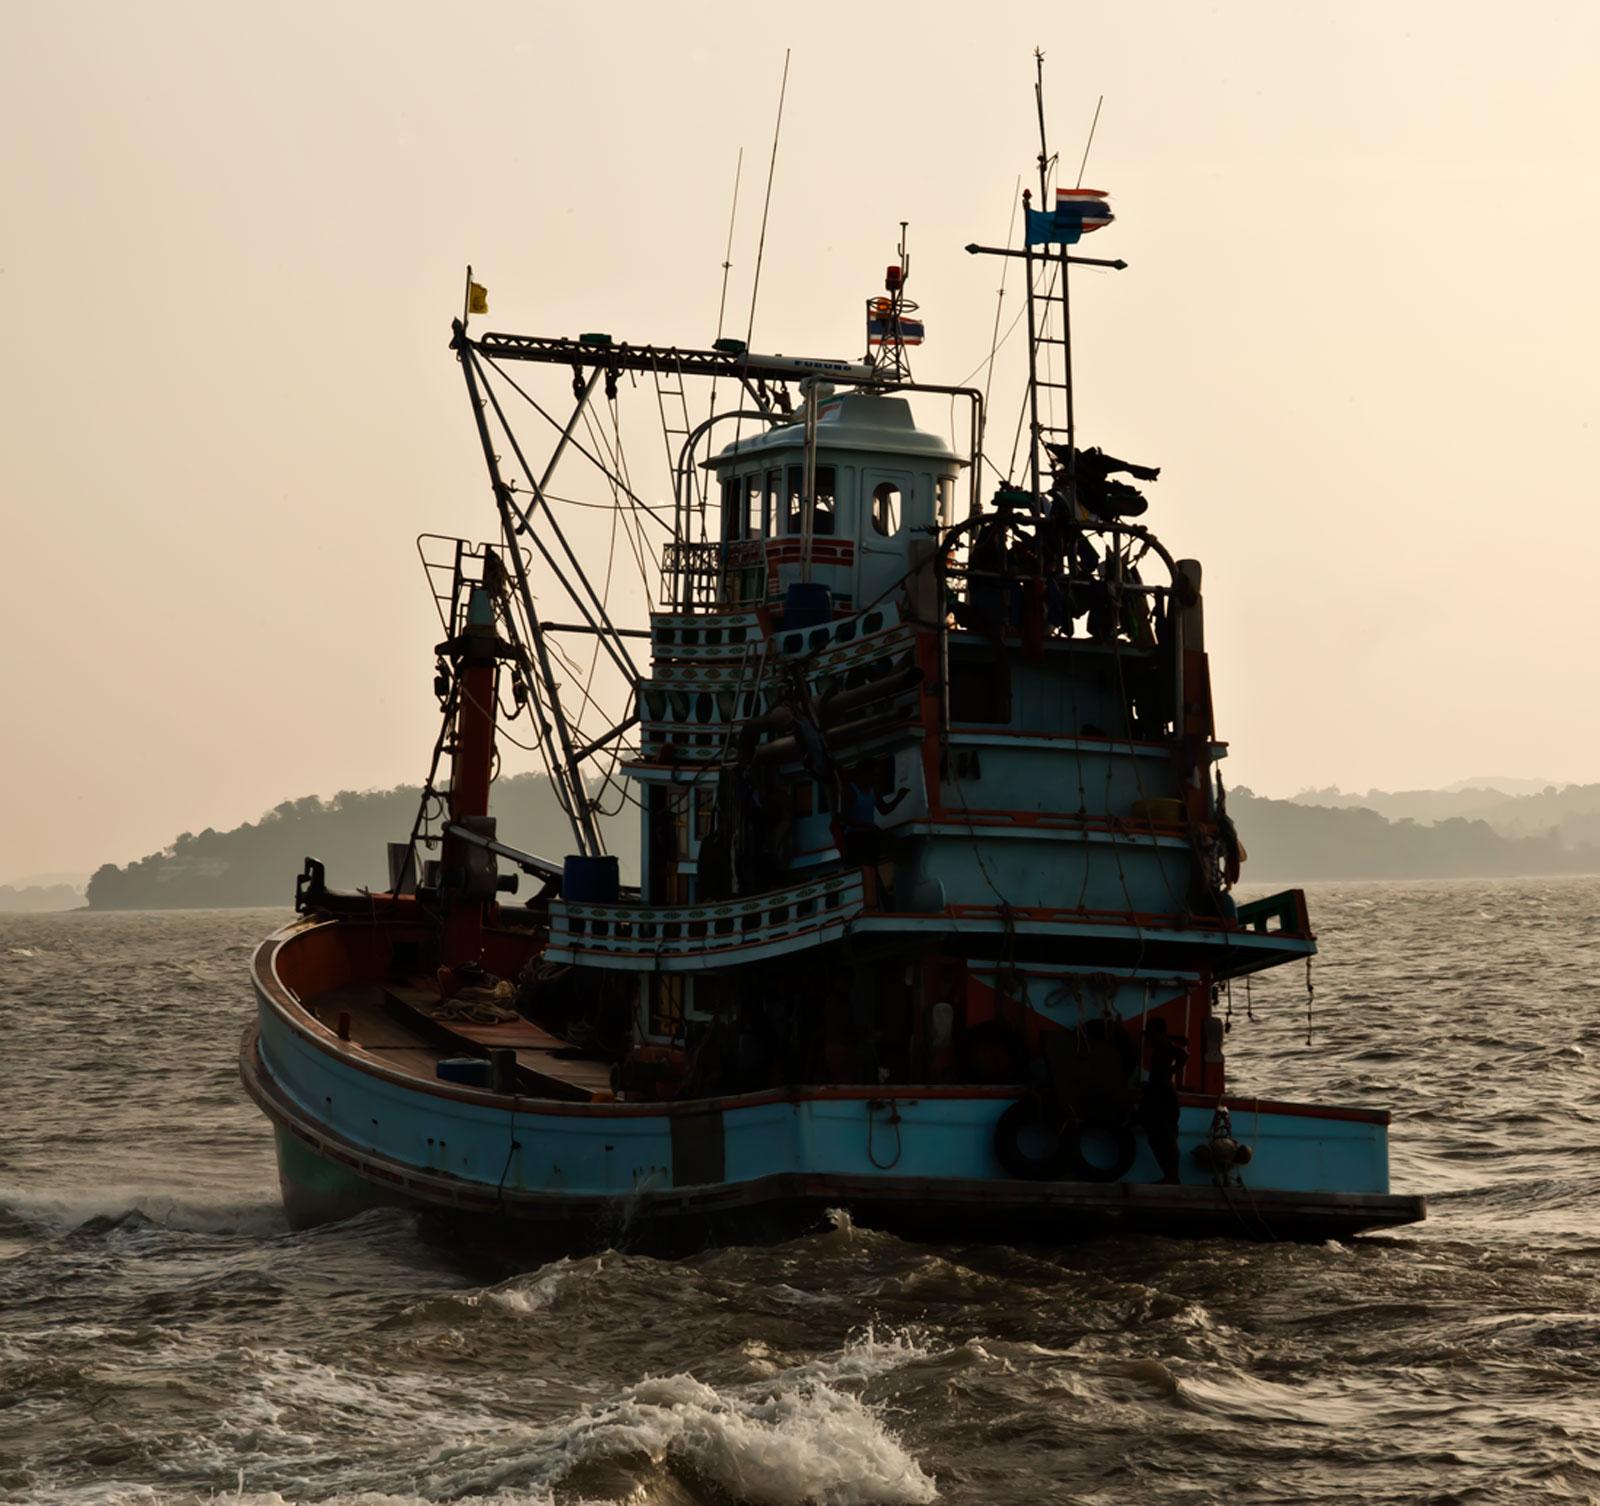 Thai fishing boat PSF 3274 Phuket Province Thailand 01